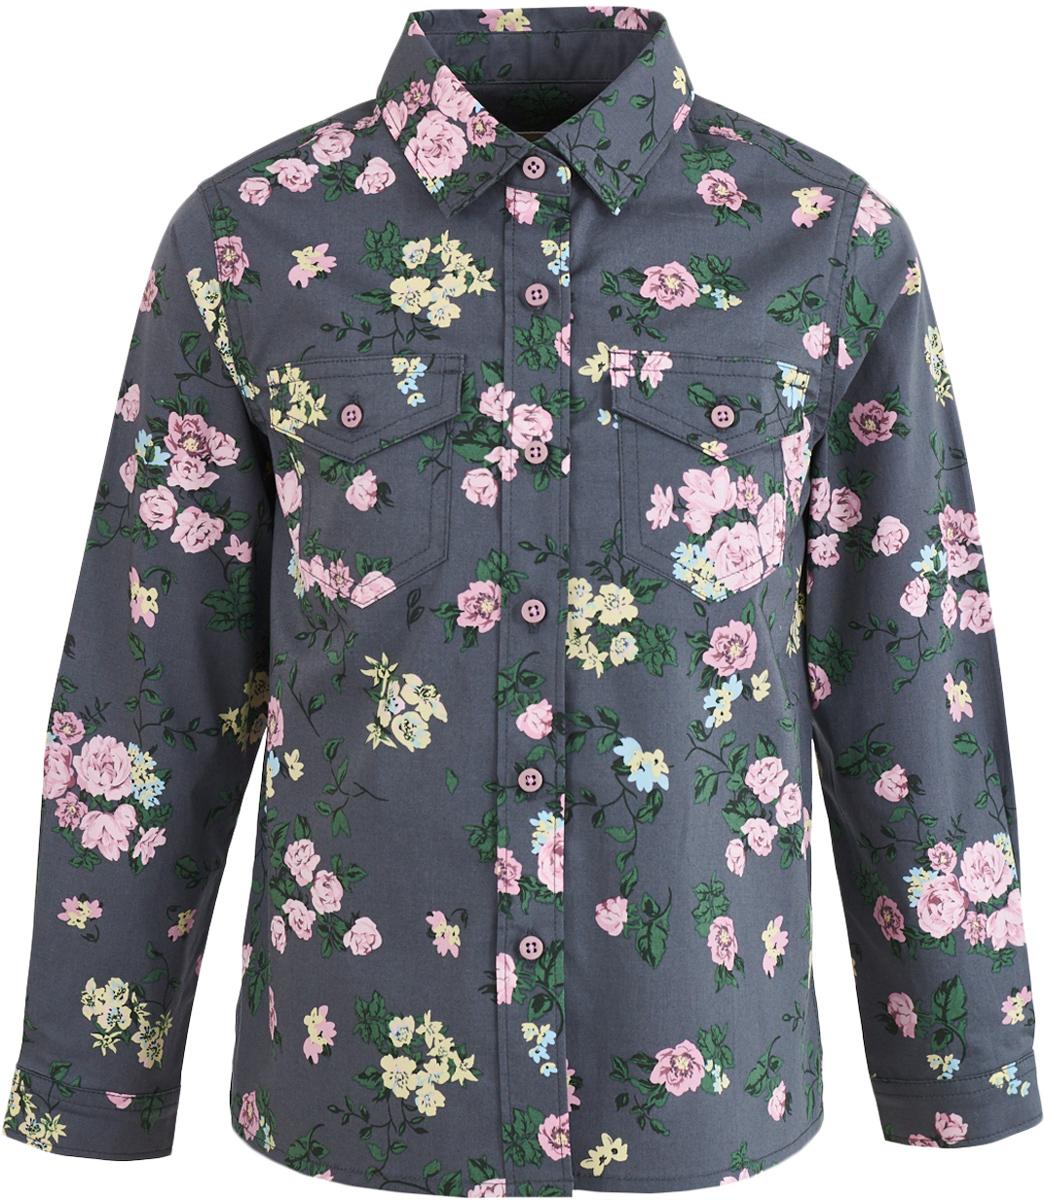 Рубашка девочки Button Blue, цвет: темно-серый. 217BBGC23012014. Размер 122, 7 лет